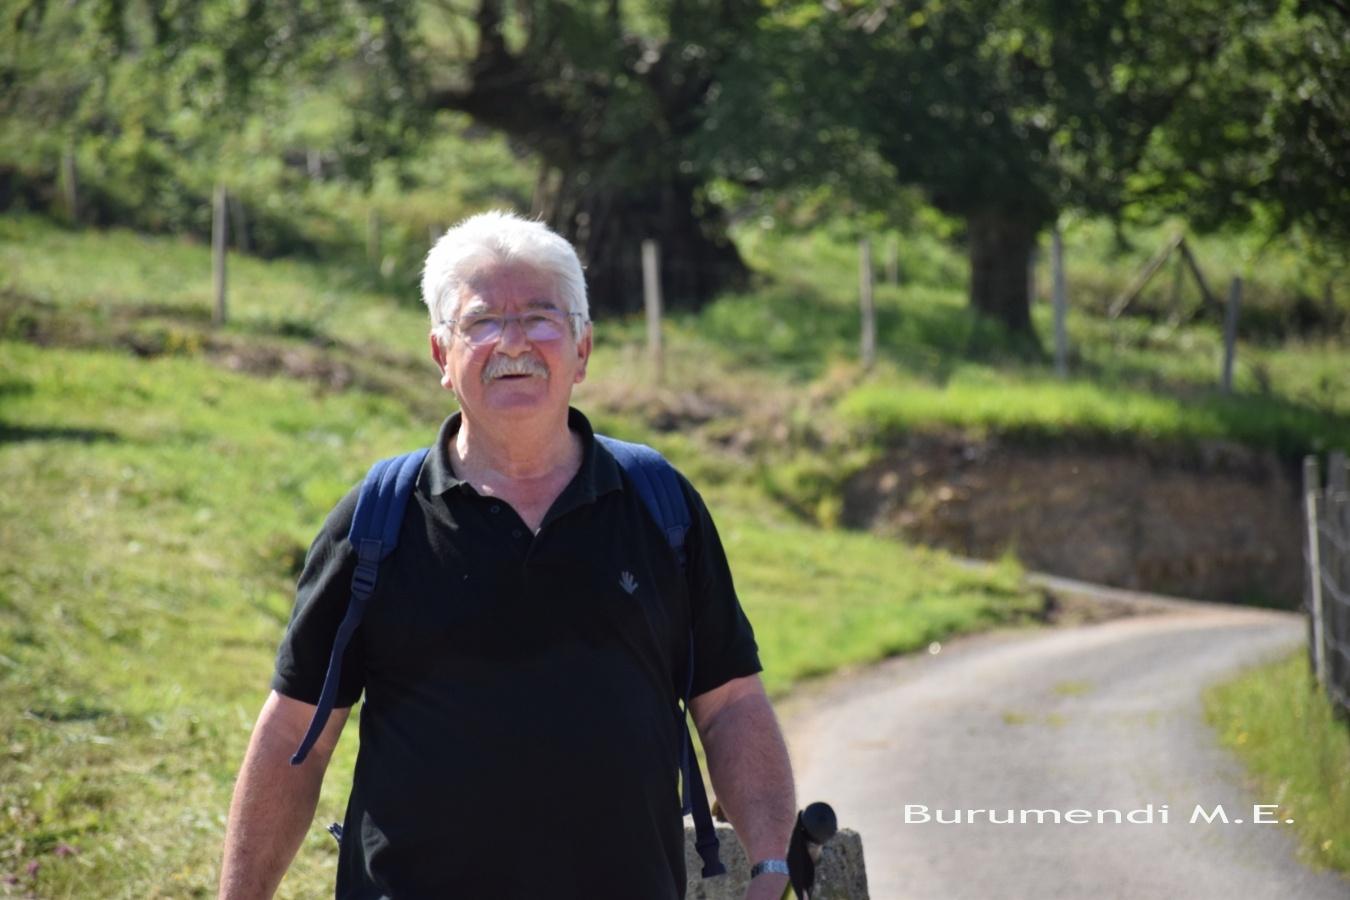 Arnoko XIV. M. L. 2018 - Burumendi Mendizale Elkartea